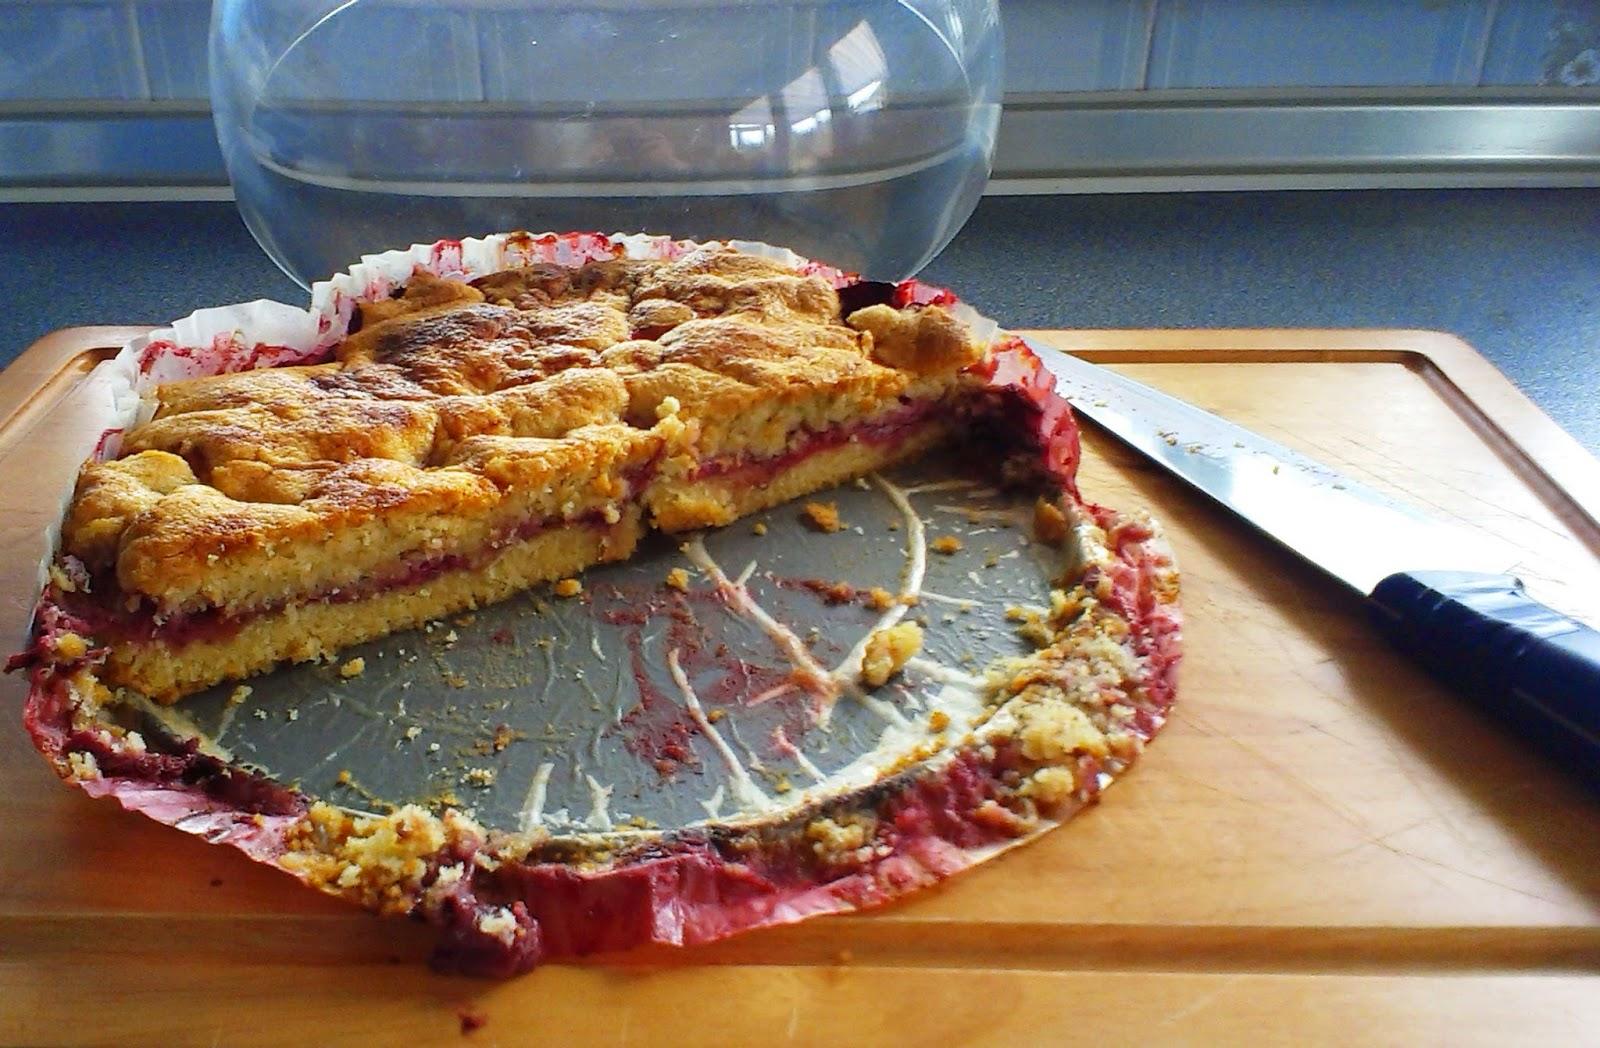 Strawberry and Cinnamon Torte